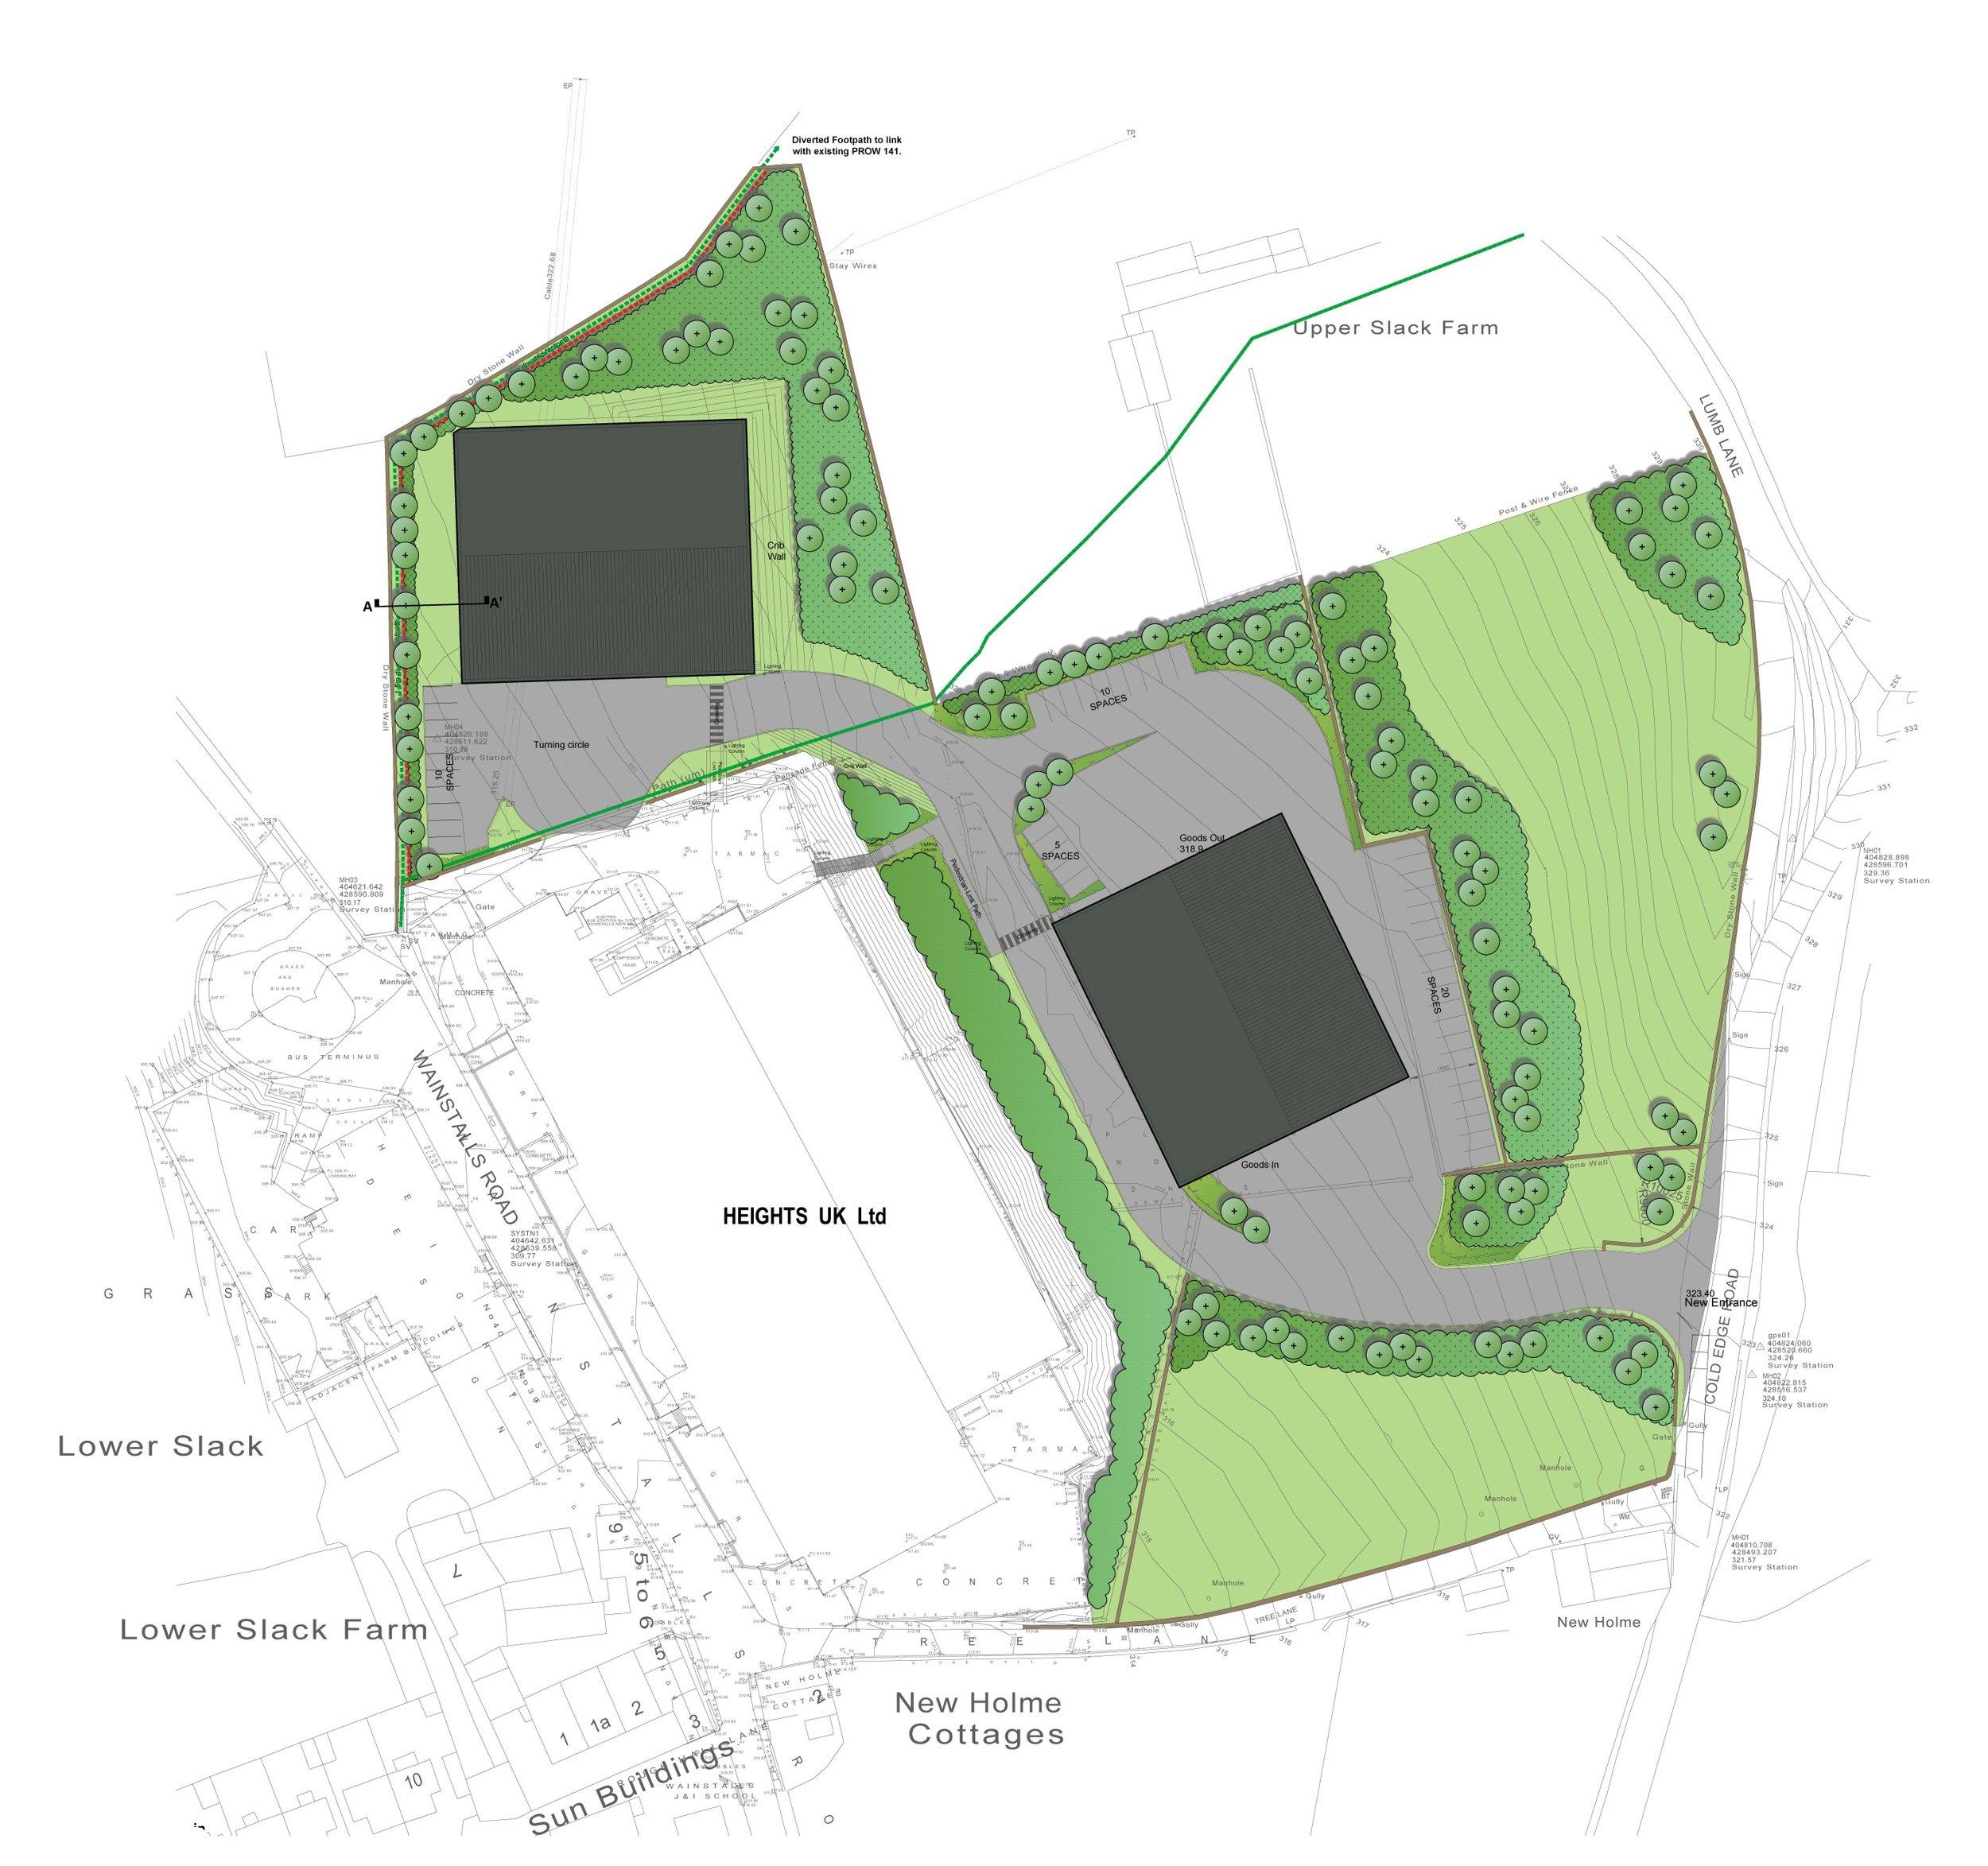 010 876 001 Heights UK Landscape Proposals Colour copy.jpg